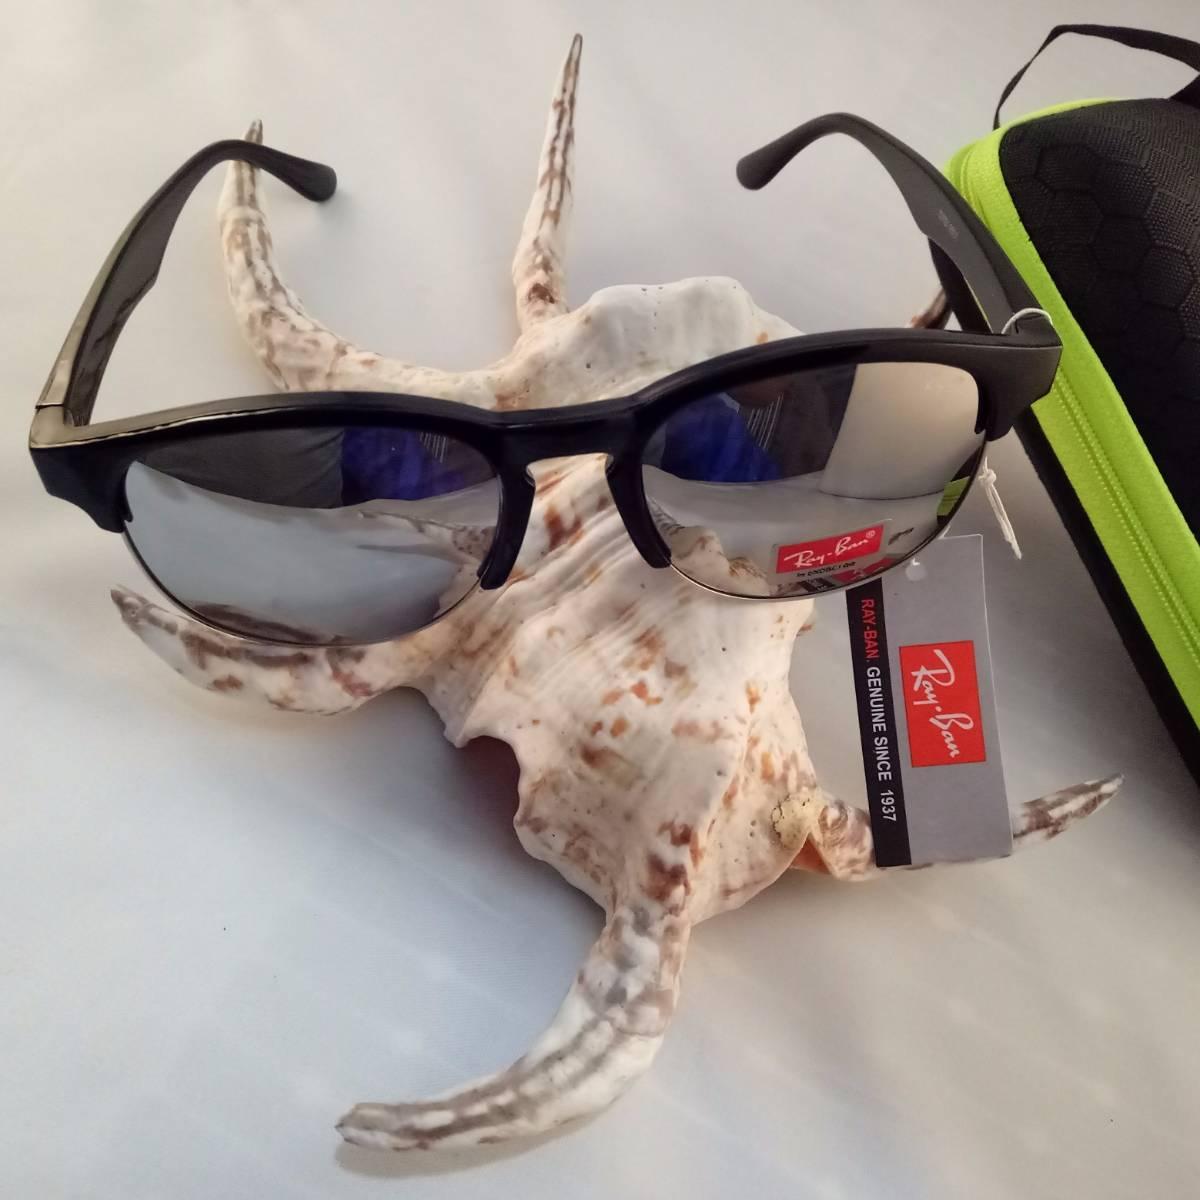 Kacamata Rayban F1 White